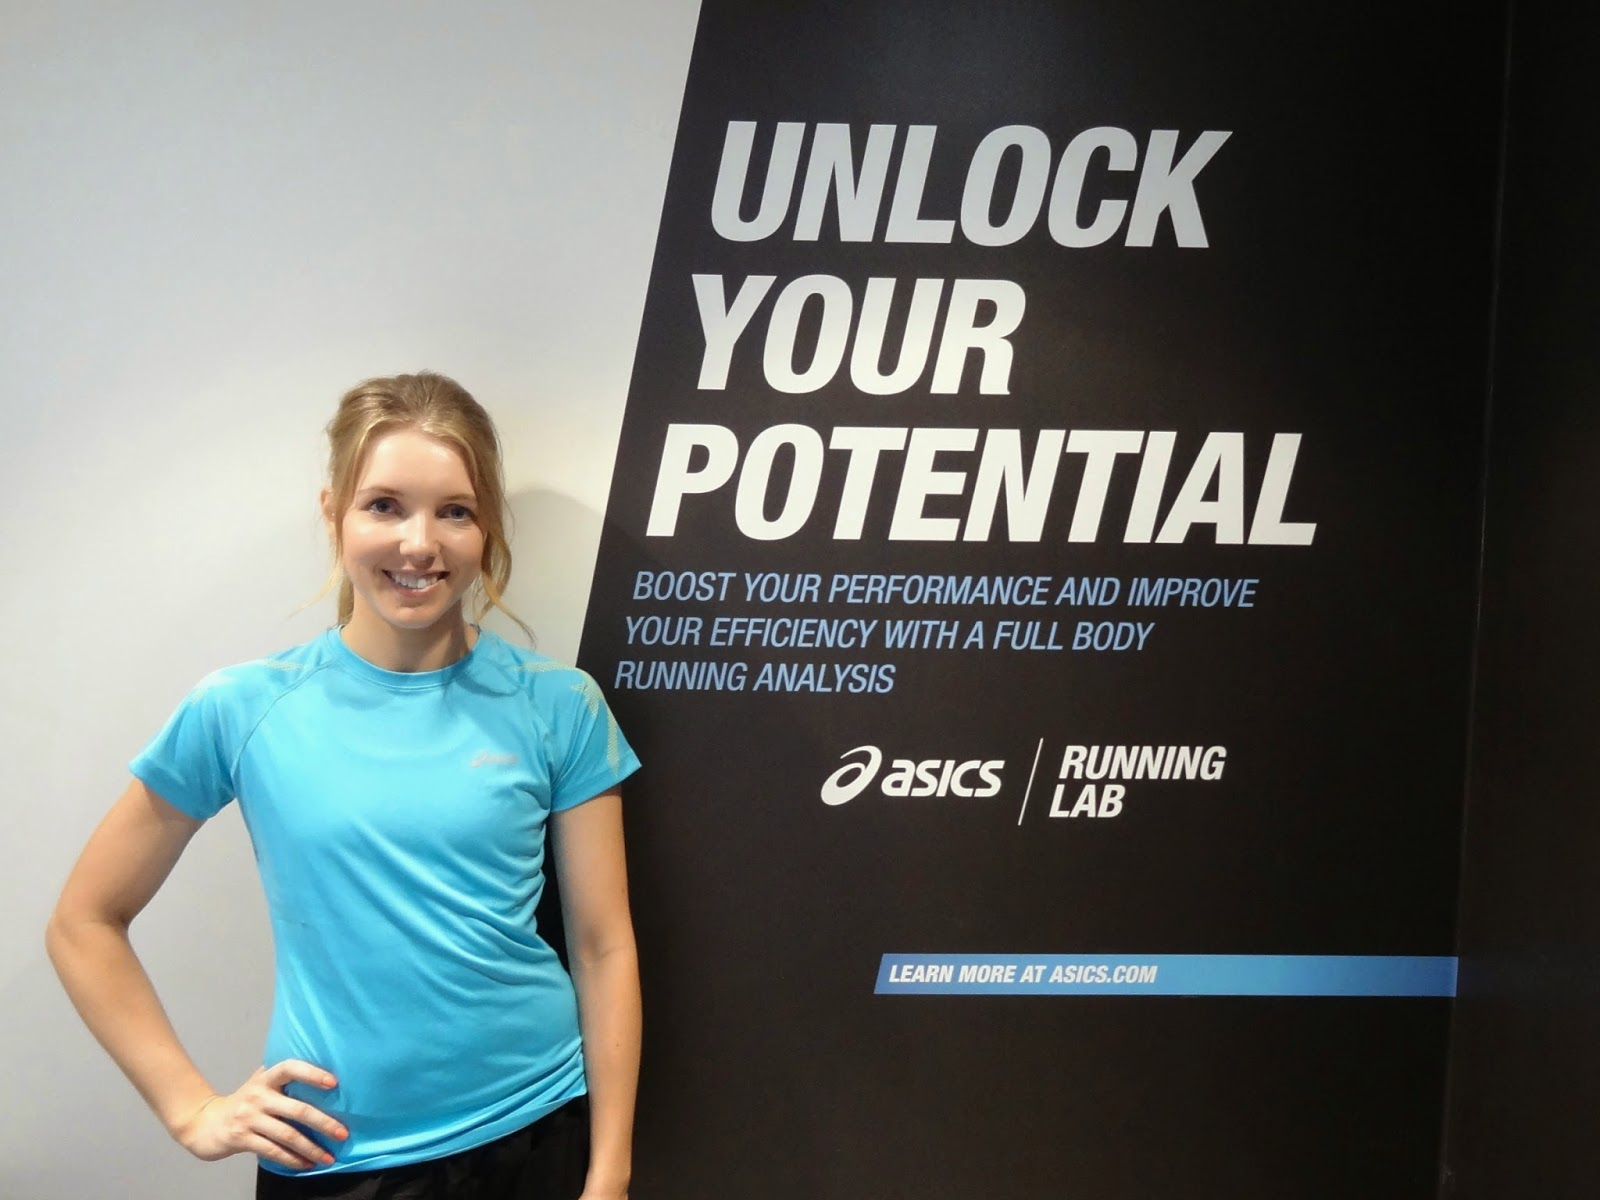 Asics Unlock Your Potential Running Lab